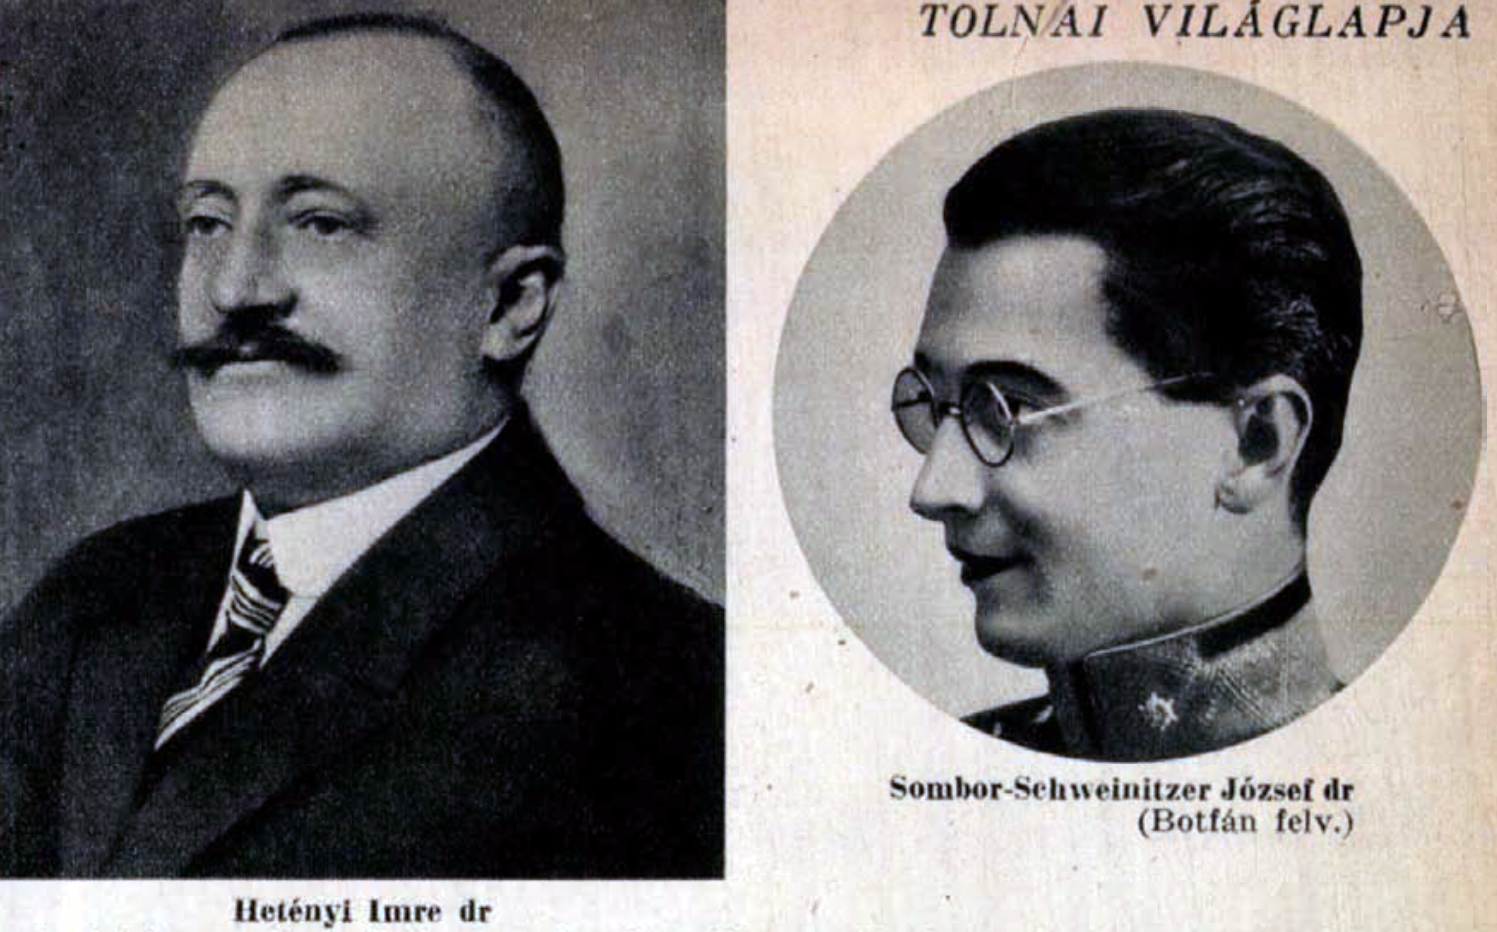 tolnaivilaglapja_1937_01_pages6-6.jpg